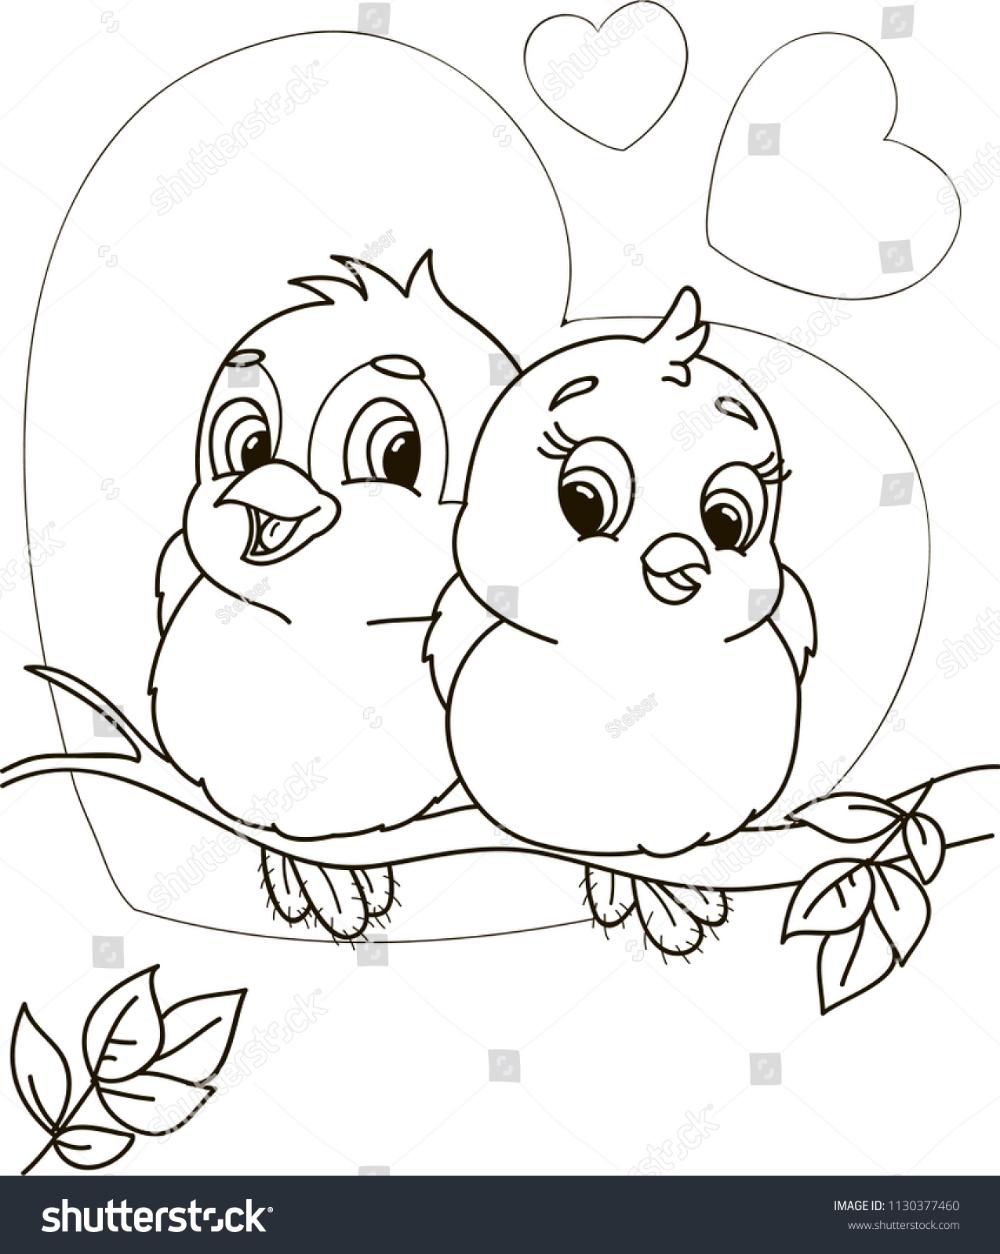 Coloring Page Outline Cartoon Cute Birds Stock Vector (Royalty ...